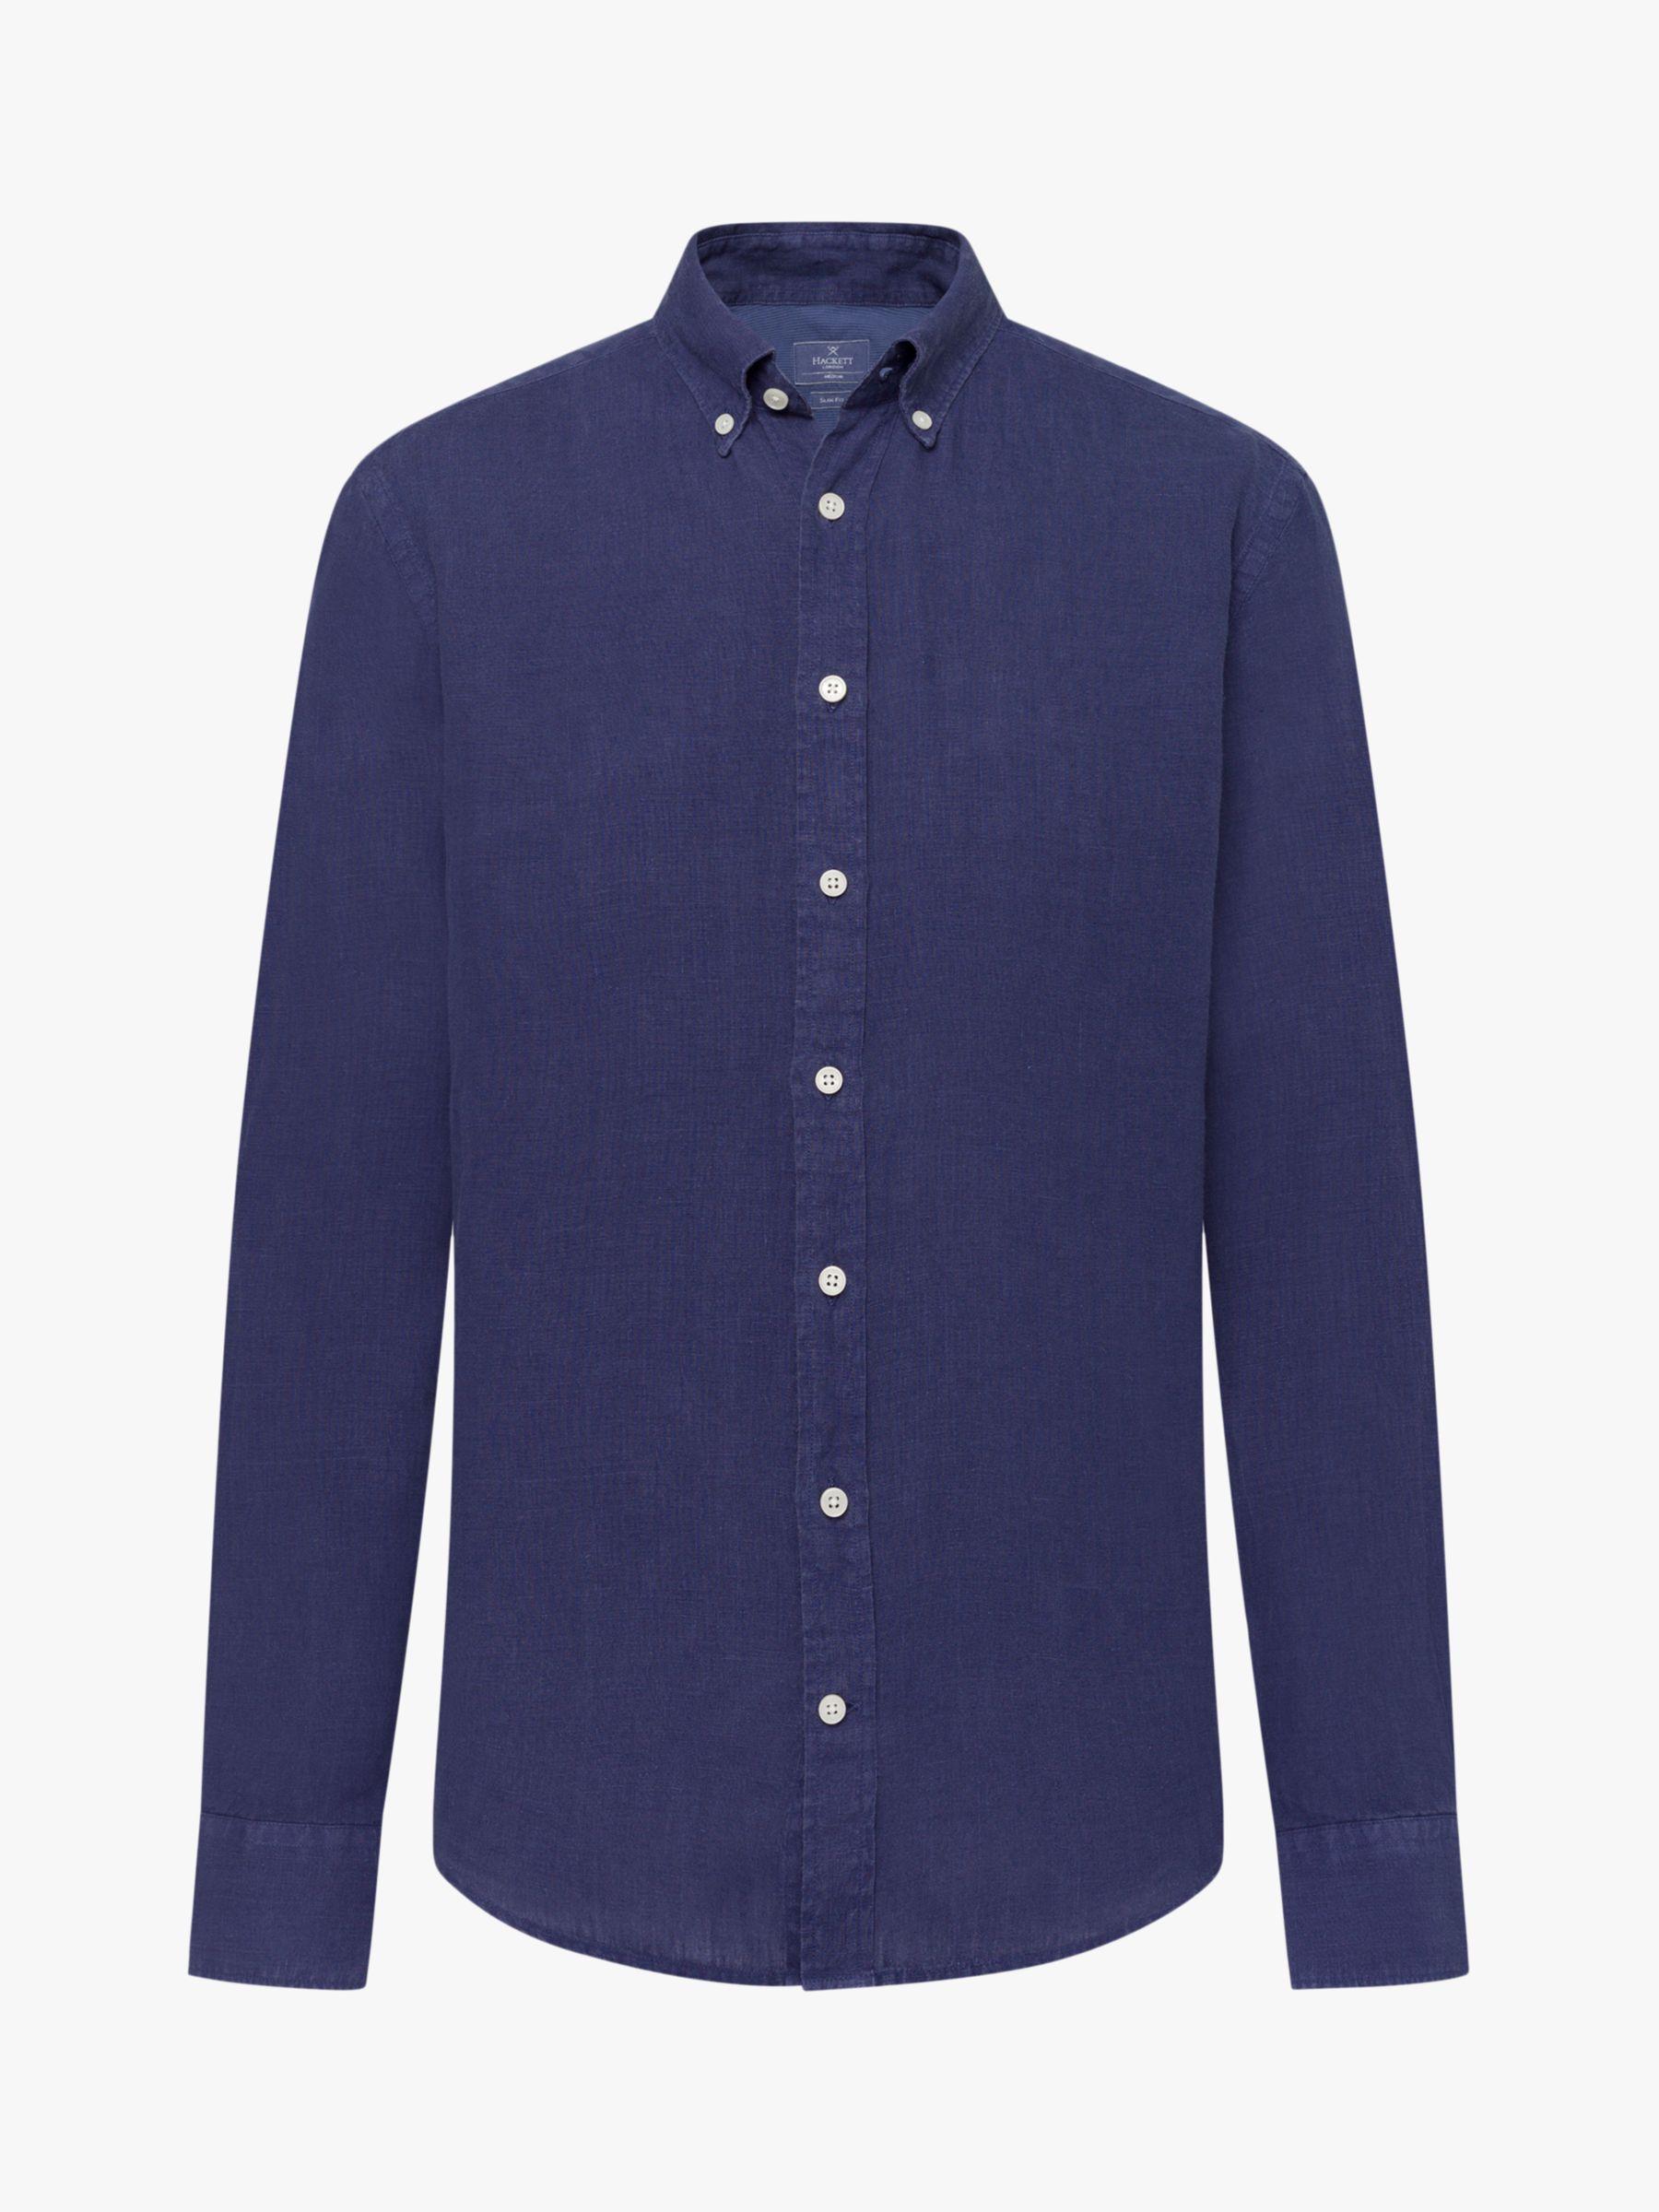 Hackett London Hackett London Yarn Dyed Linen Shirt